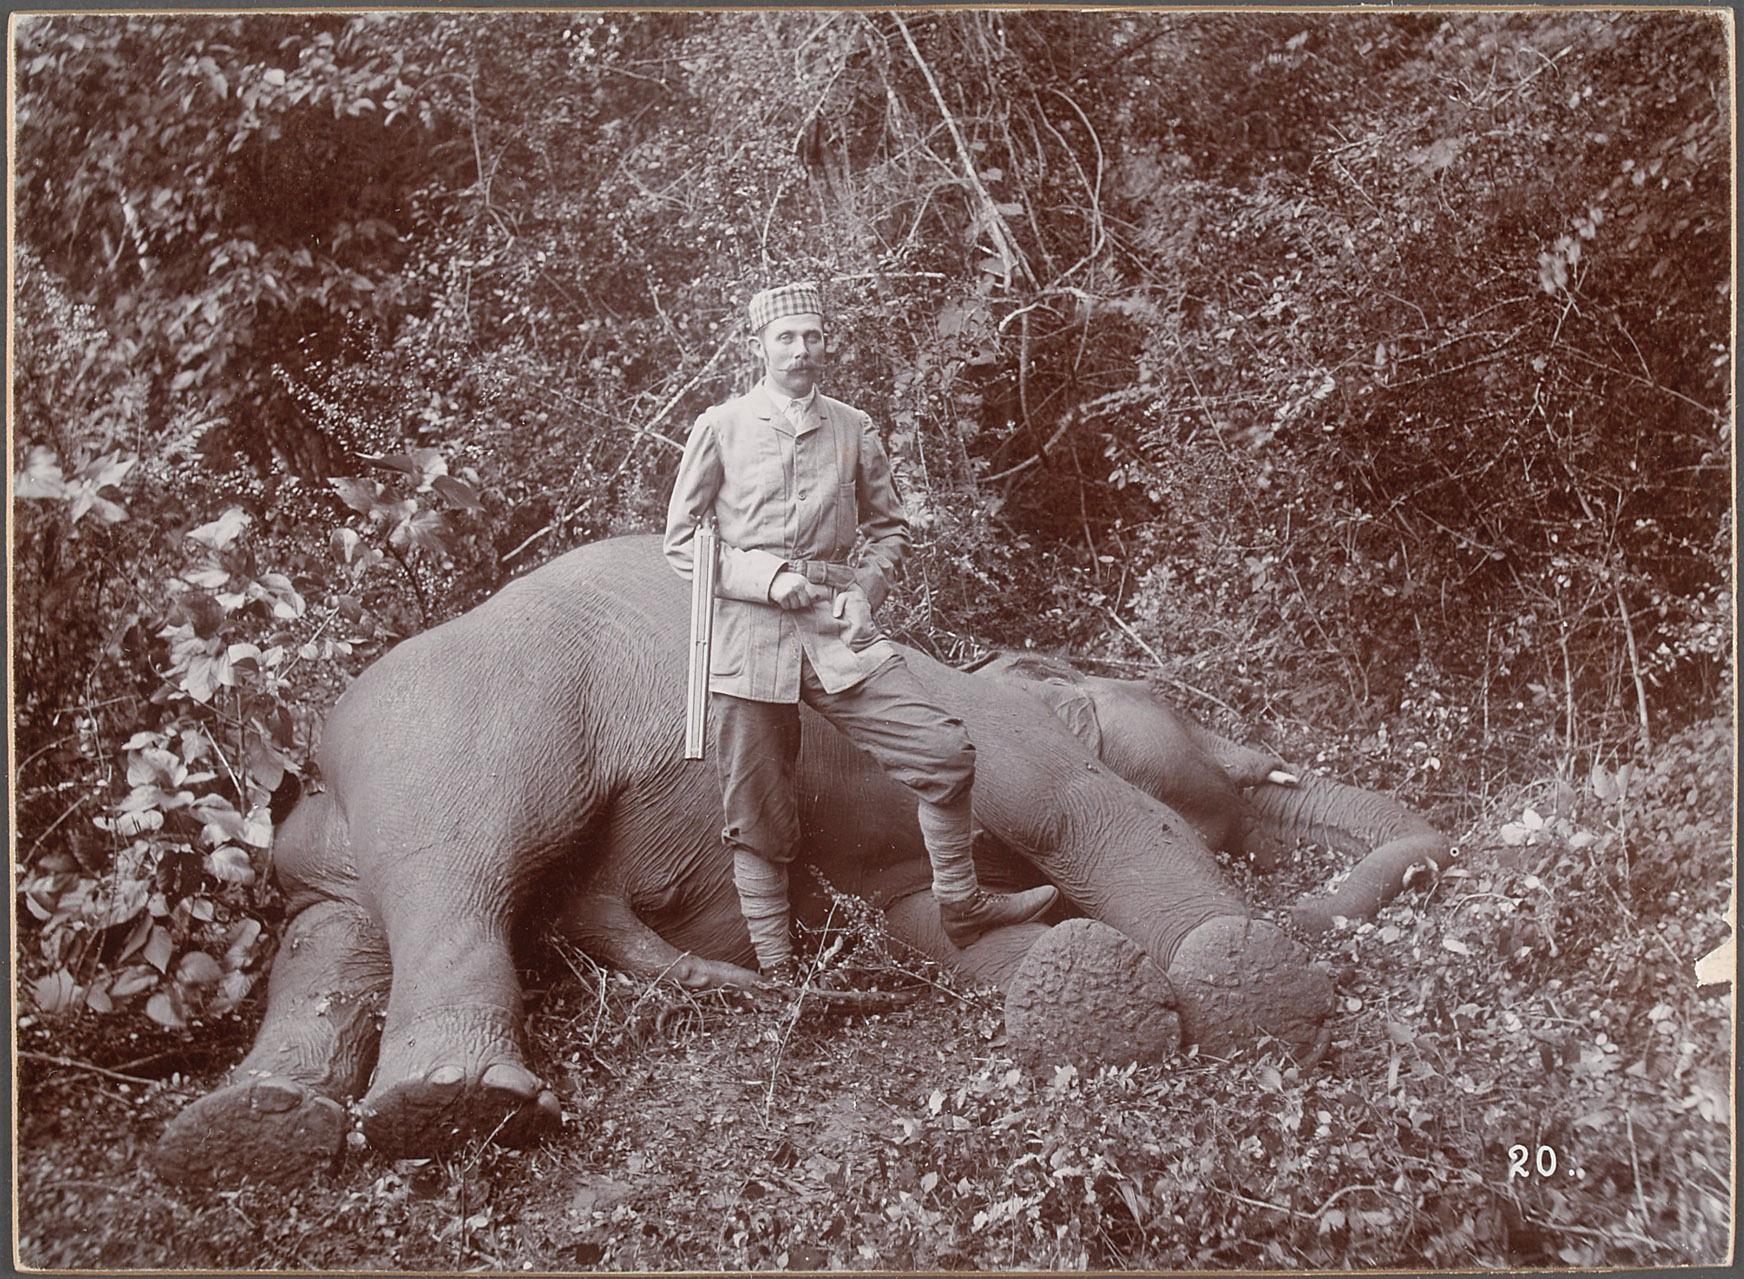 Sr k.u.k. Hoheit beim erlegten Elephanten von Eduard Hodek jun.